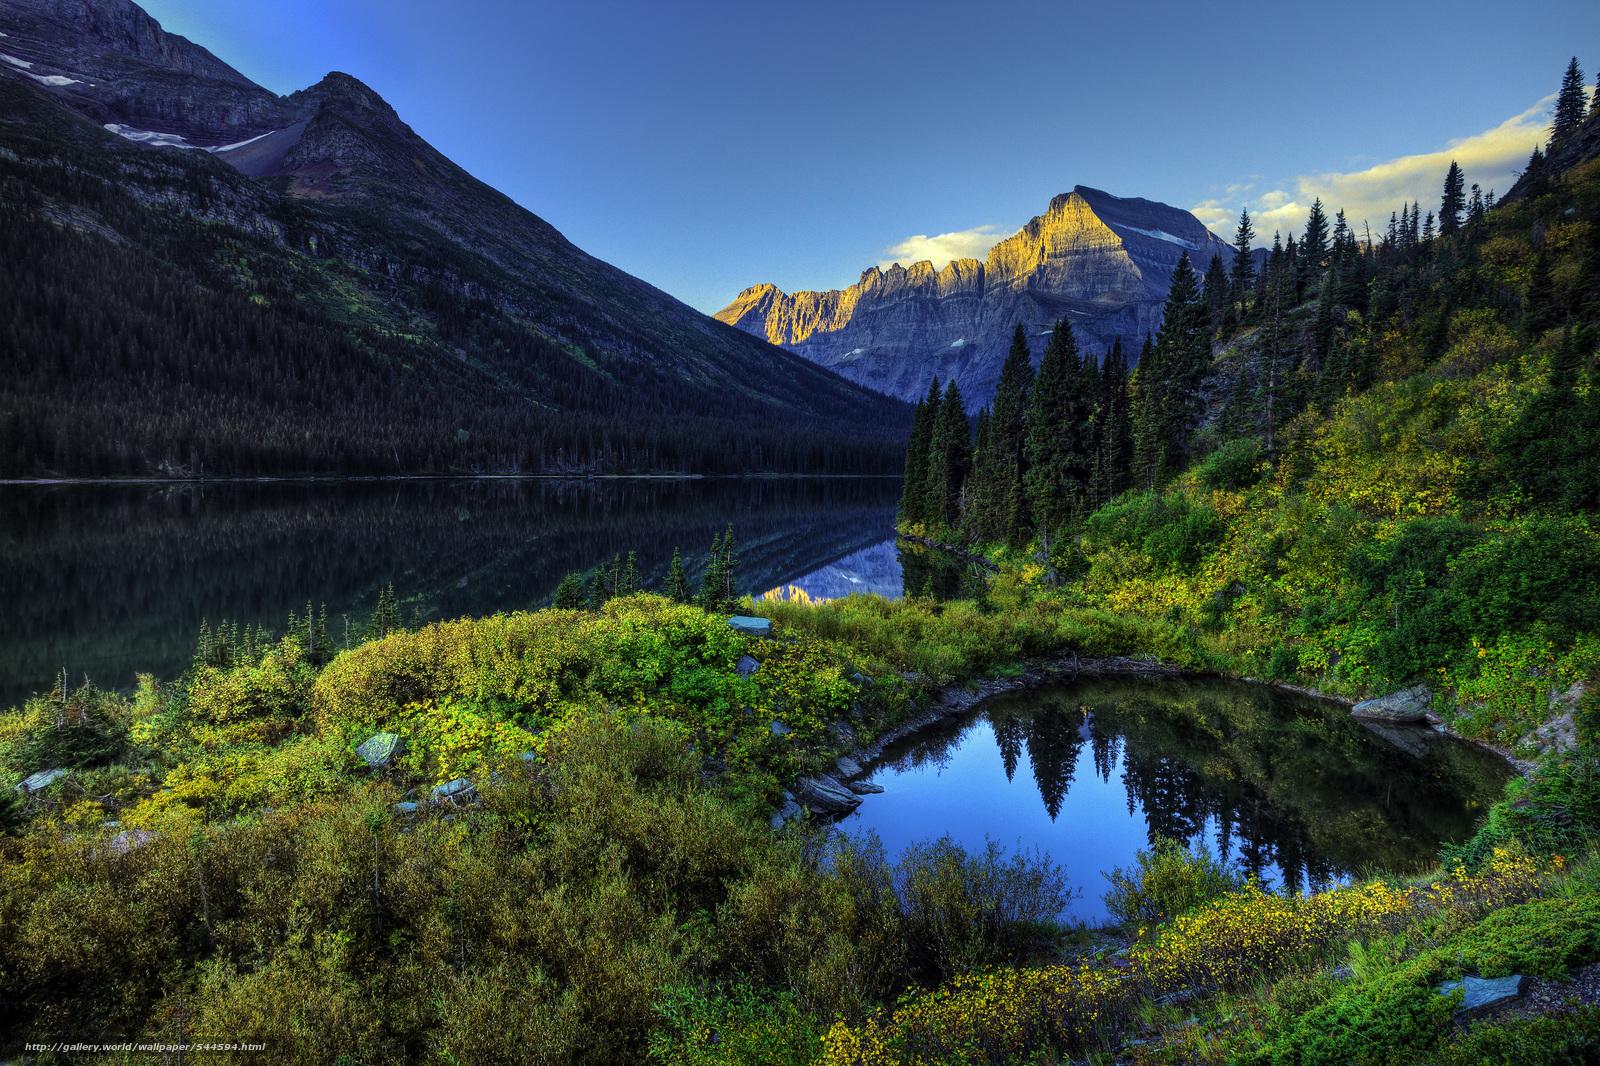 wallpaper Glacier National Park lake Mountains trees desktop 1600x1066